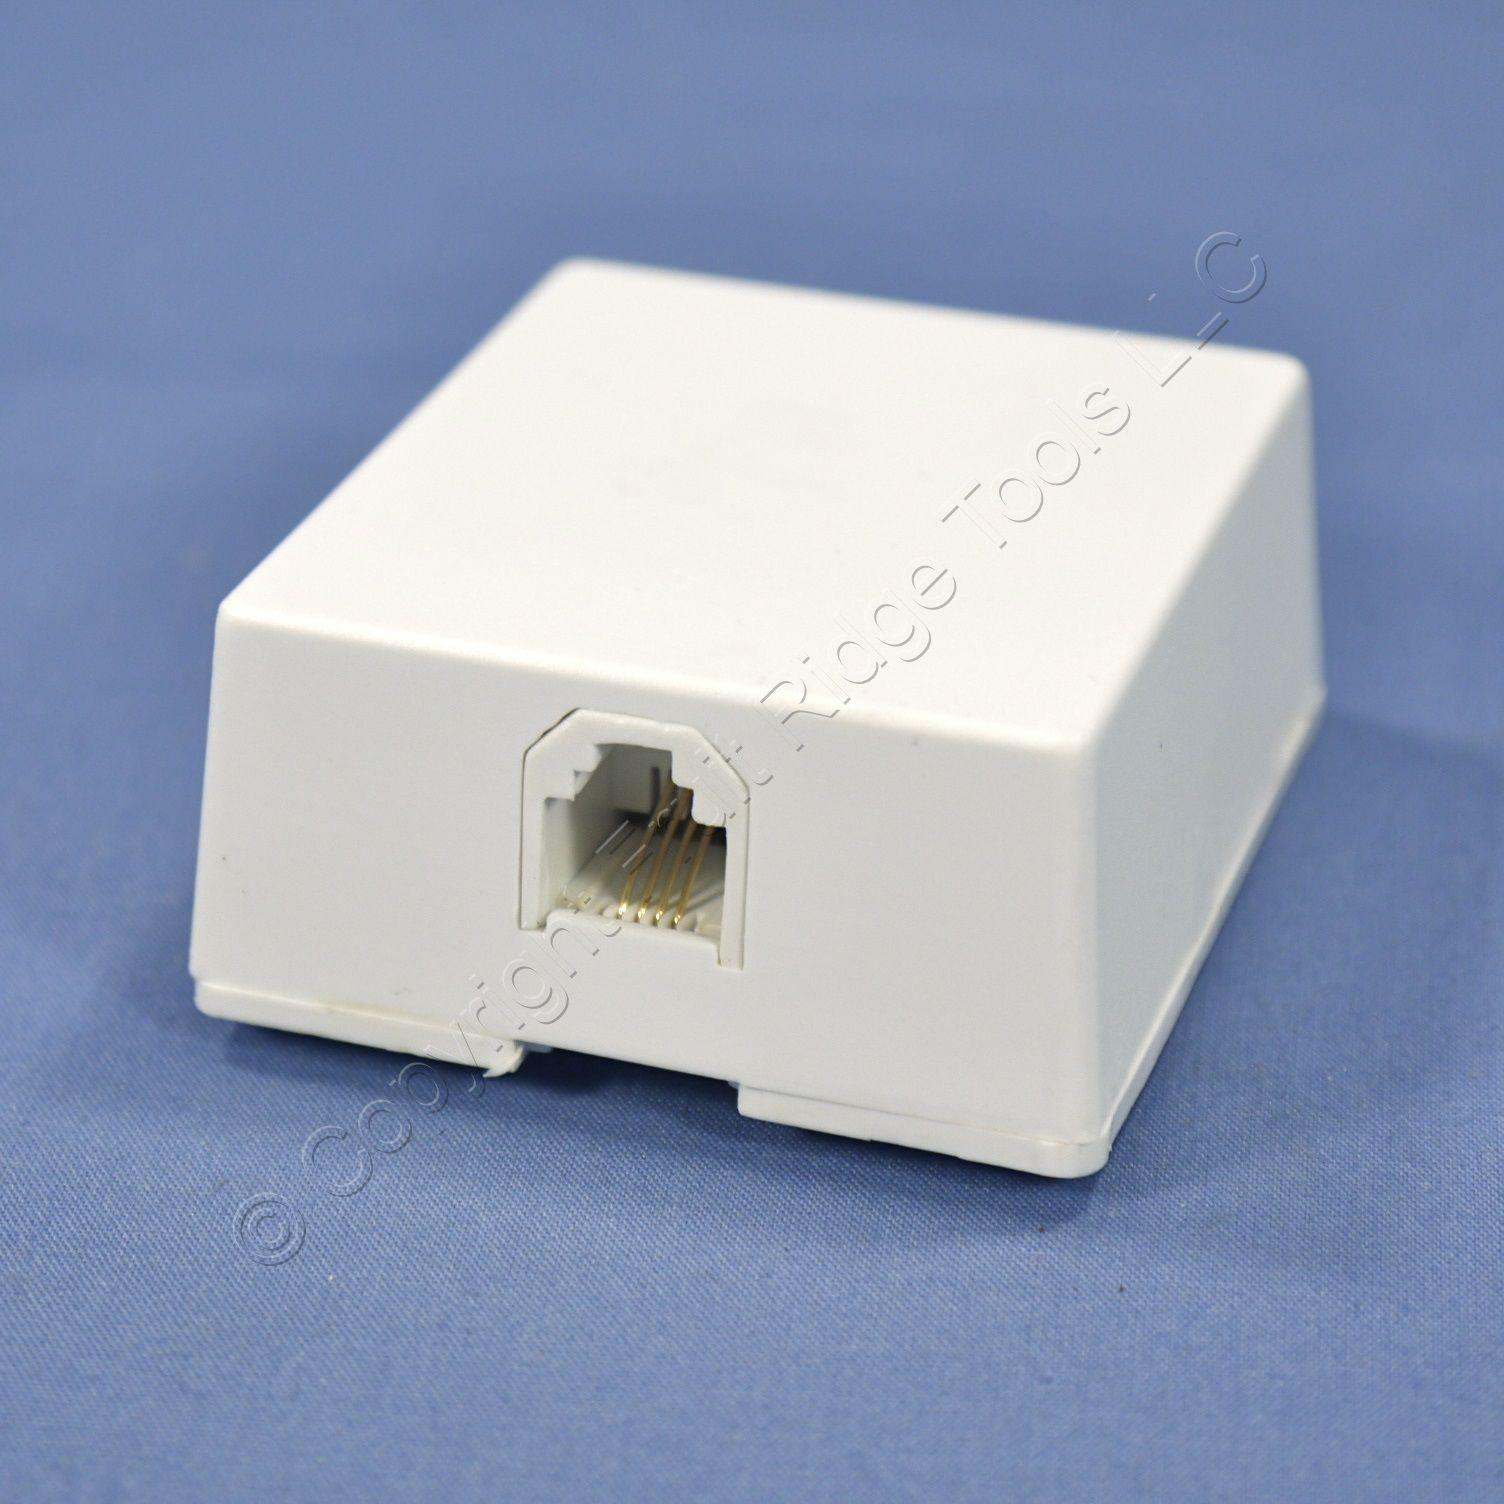 leviton white surface mount phone jack 4 wire telephone. Black Bedroom Furniture Sets. Home Design Ideas